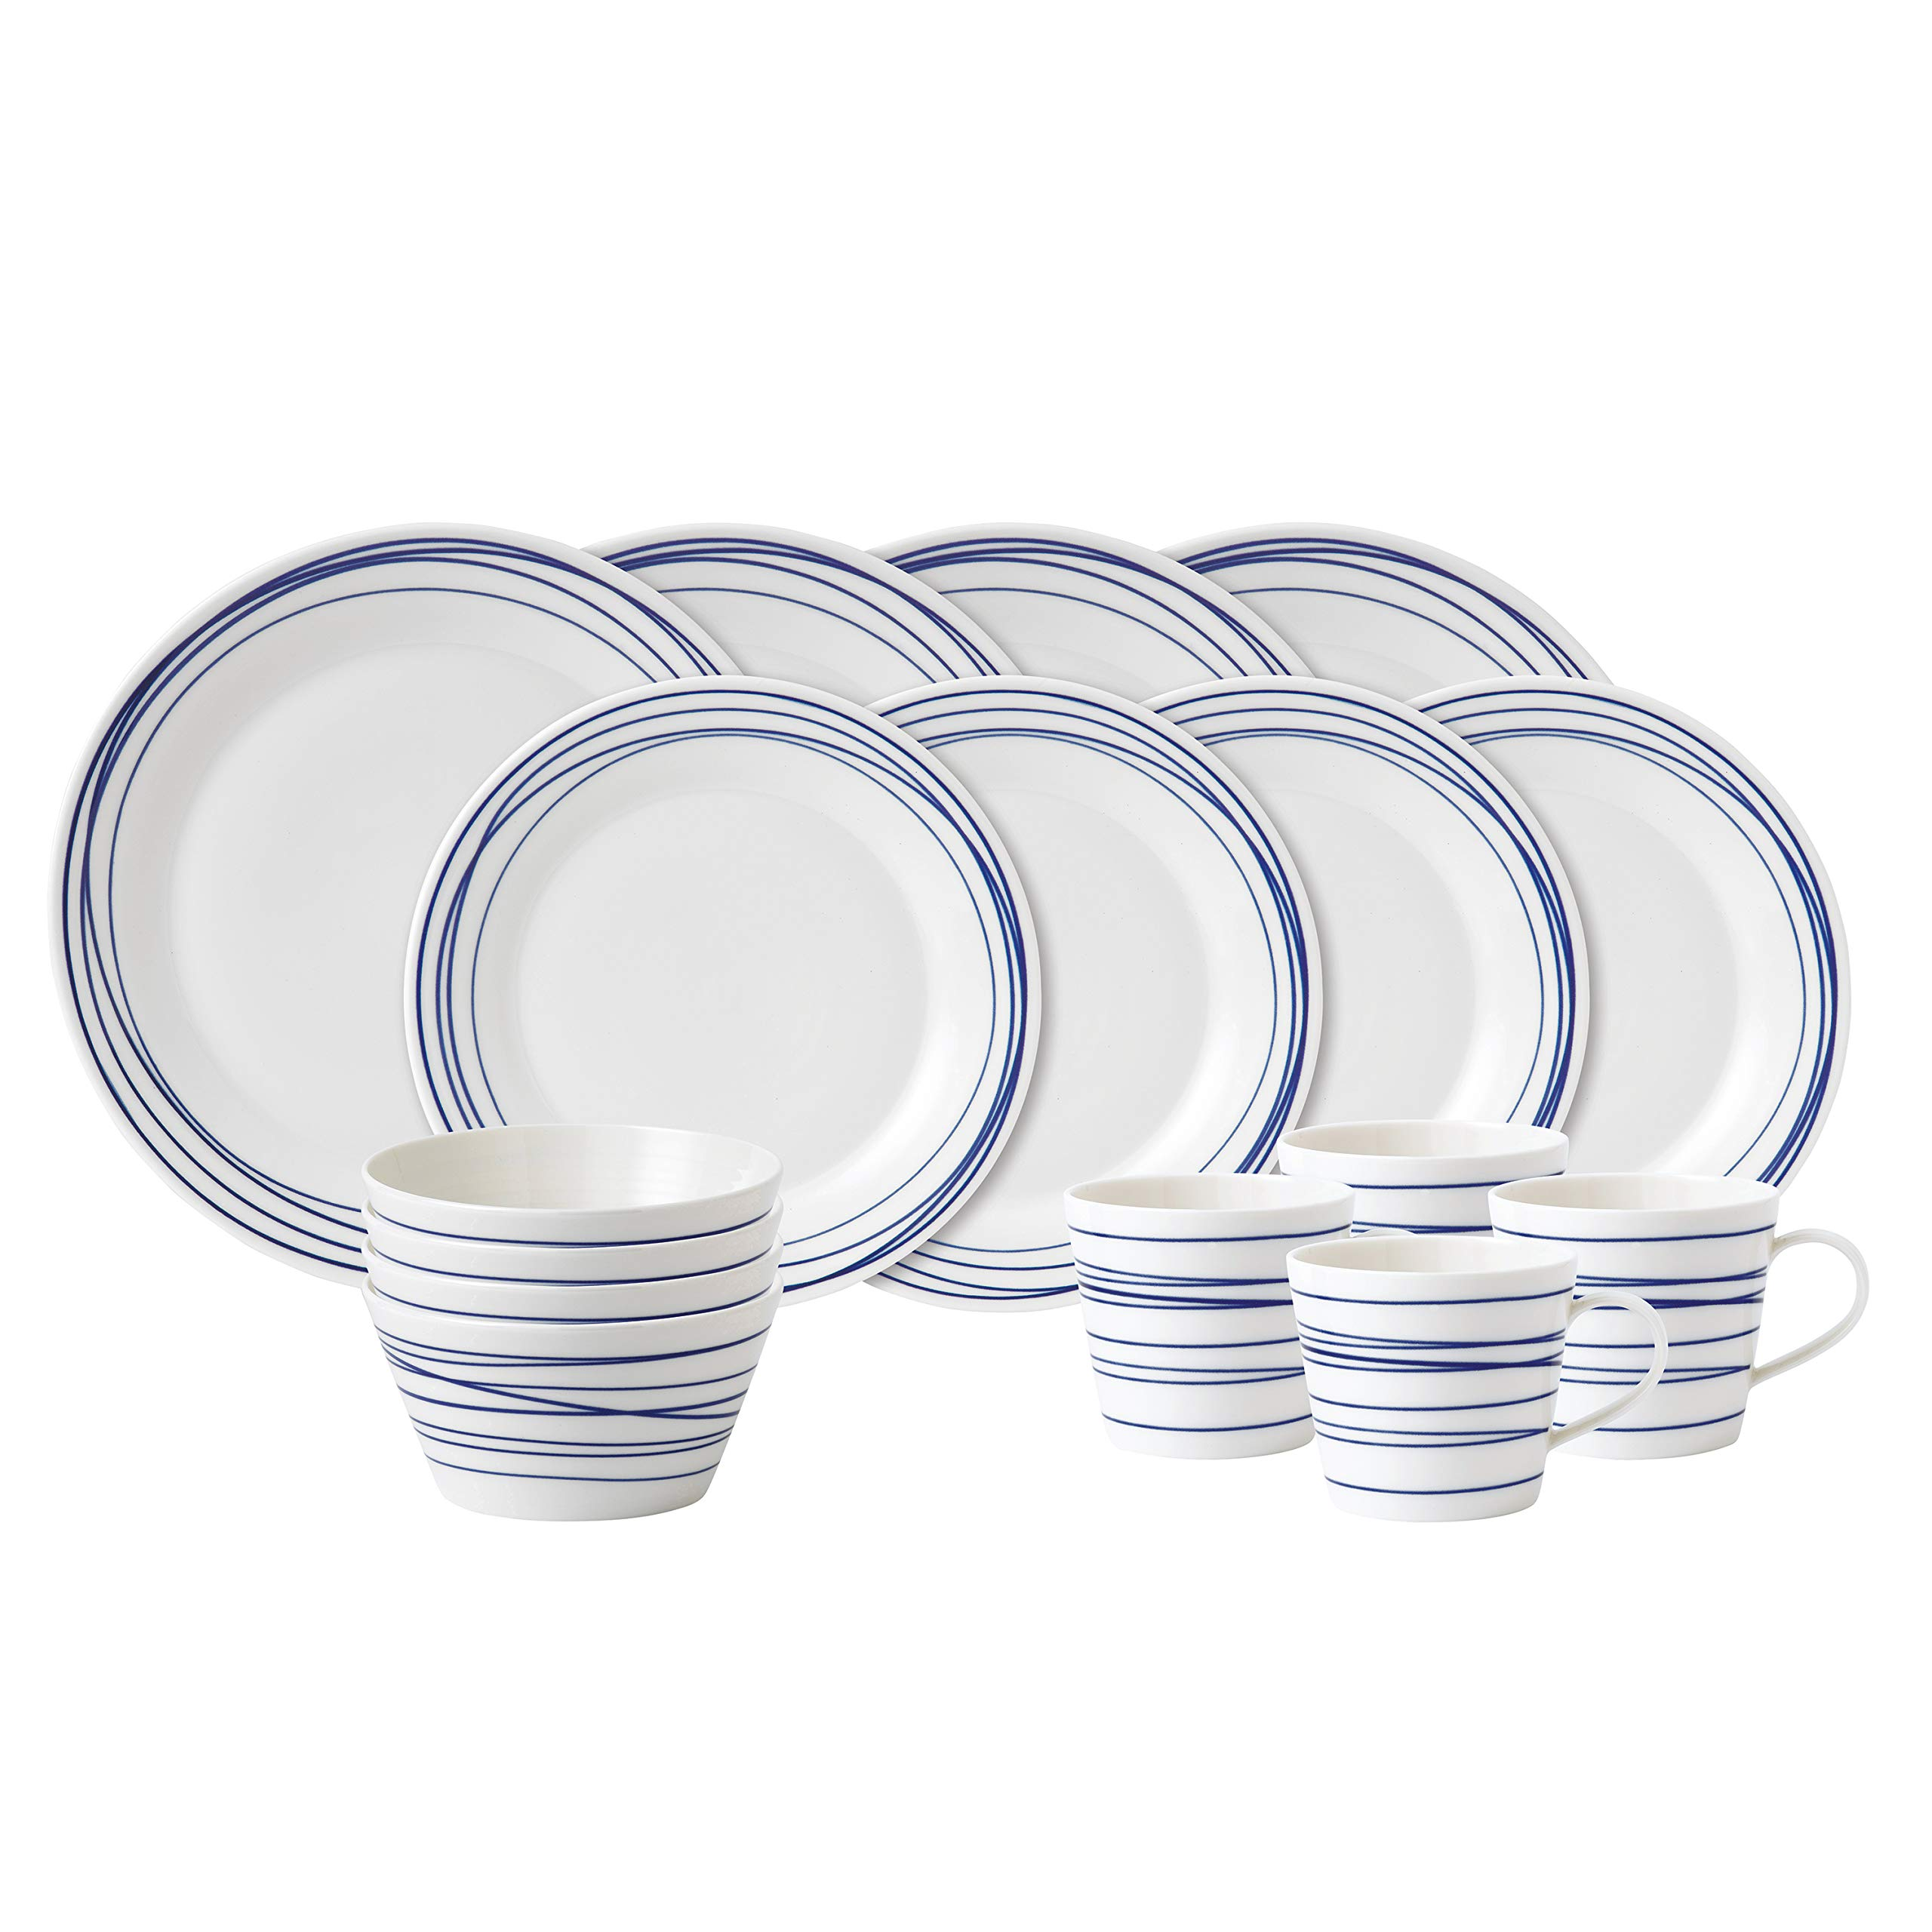 Royal Doulton 40021448 Pacific 16 Piece Set Lines Dinnerware Set, Multiple